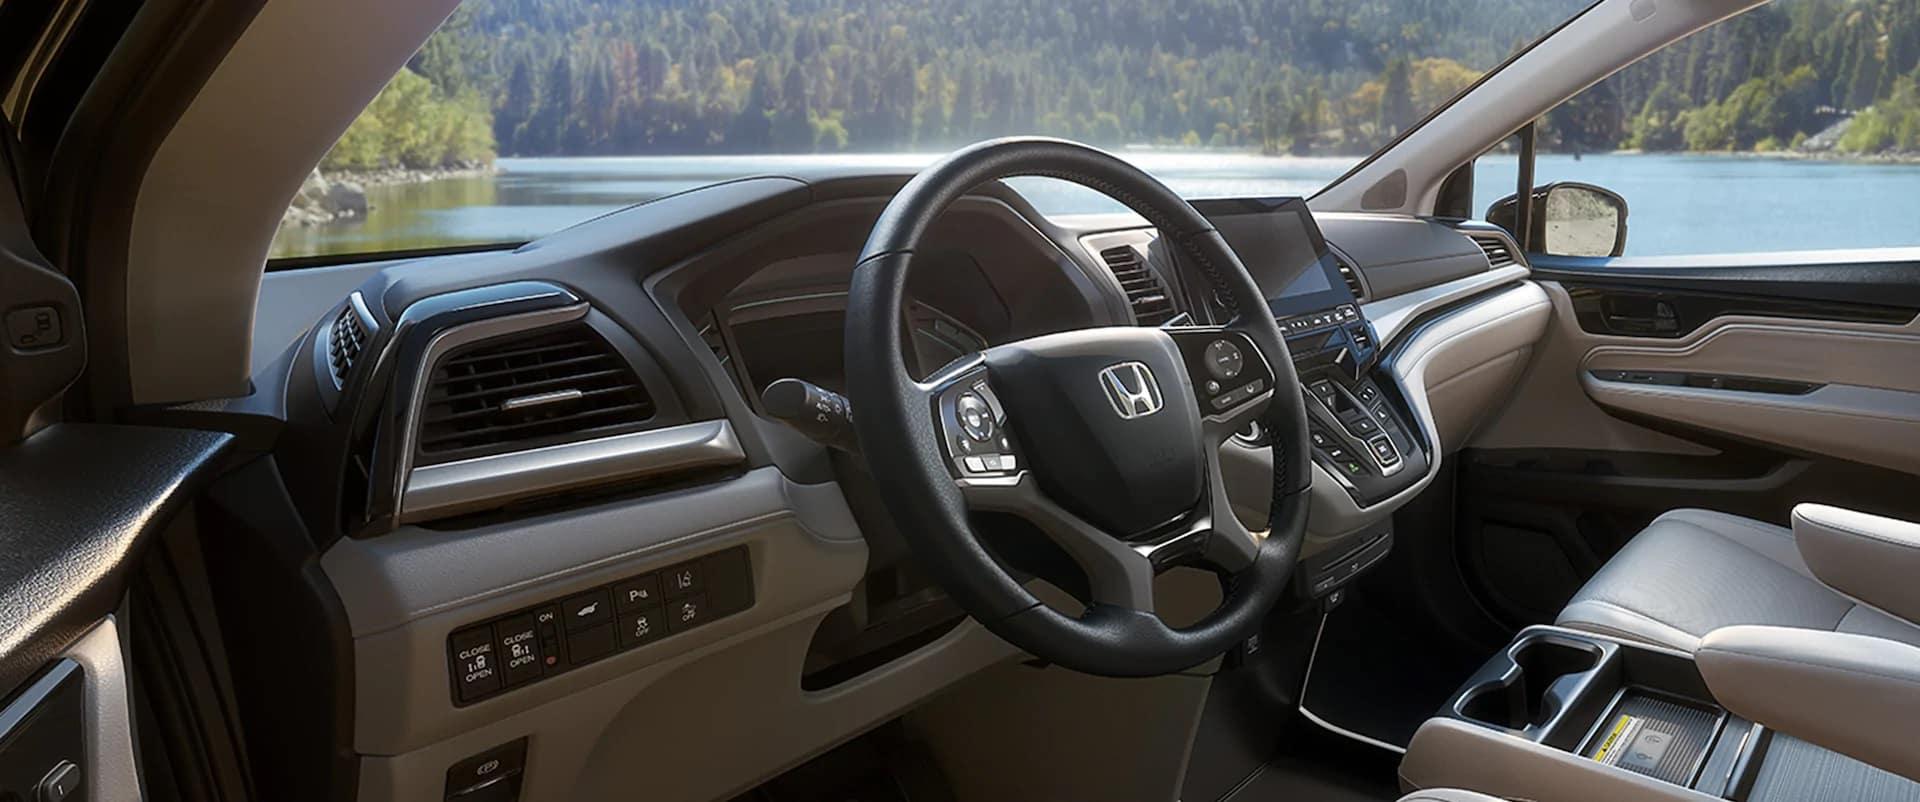 Honda_Odyssey_Interior_Dashboard